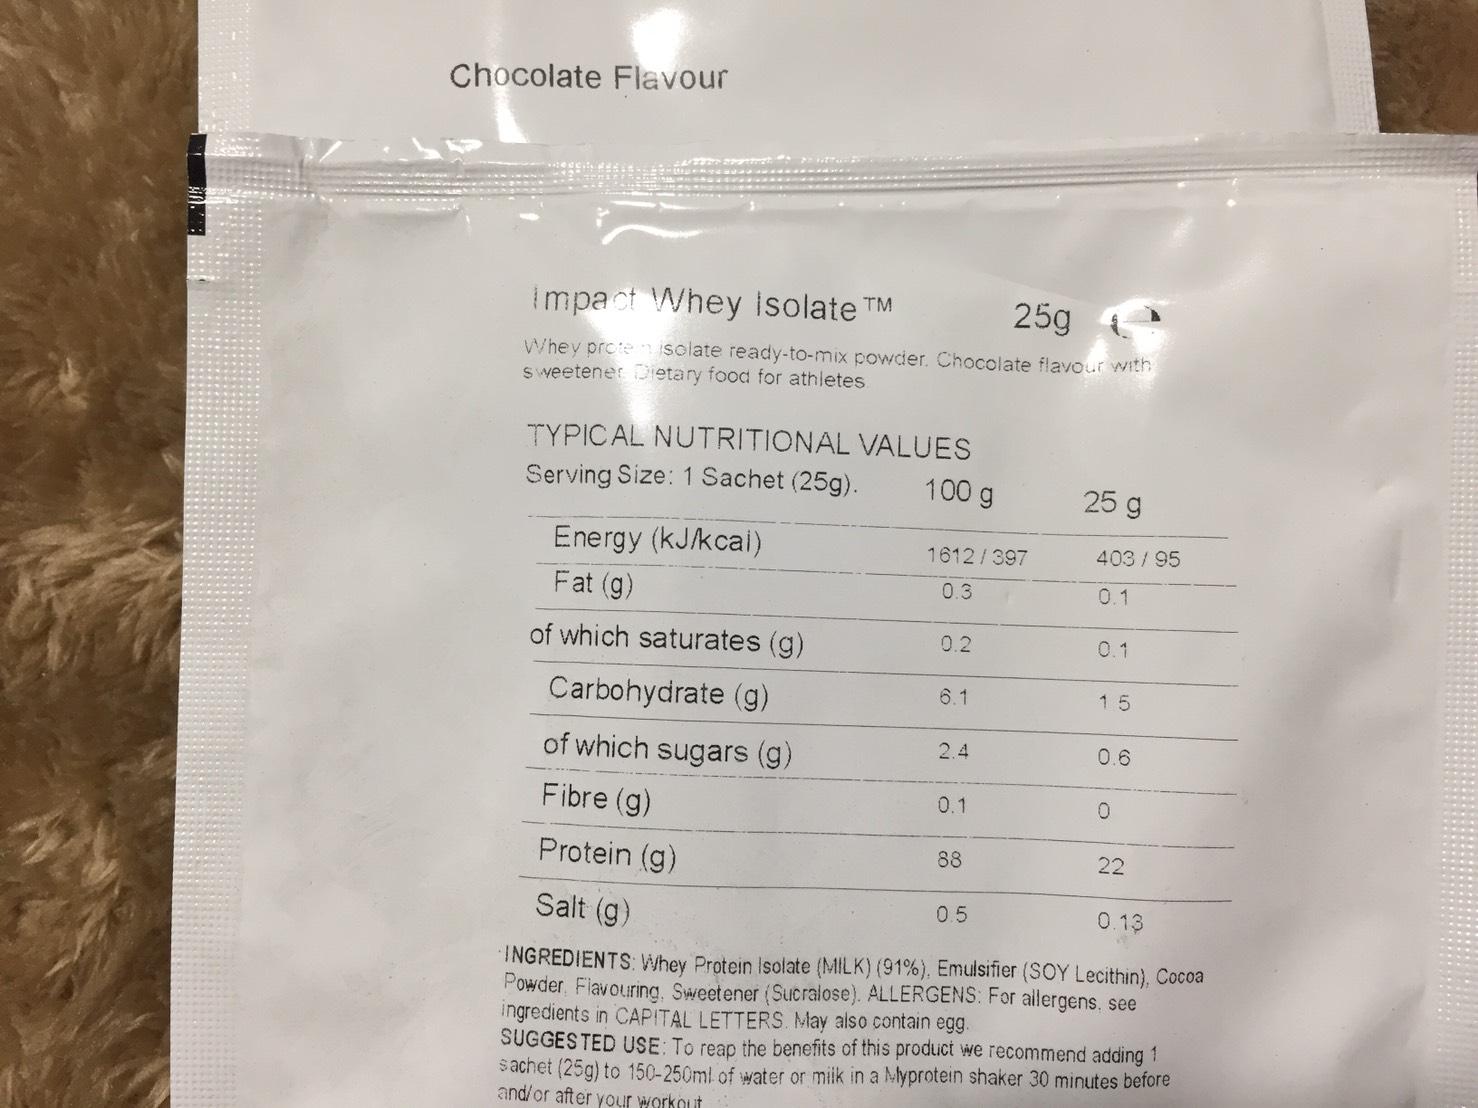 【WPI】Impactホエイアイソレート「Chocolate Flavour(チョコレート味)」の成分表